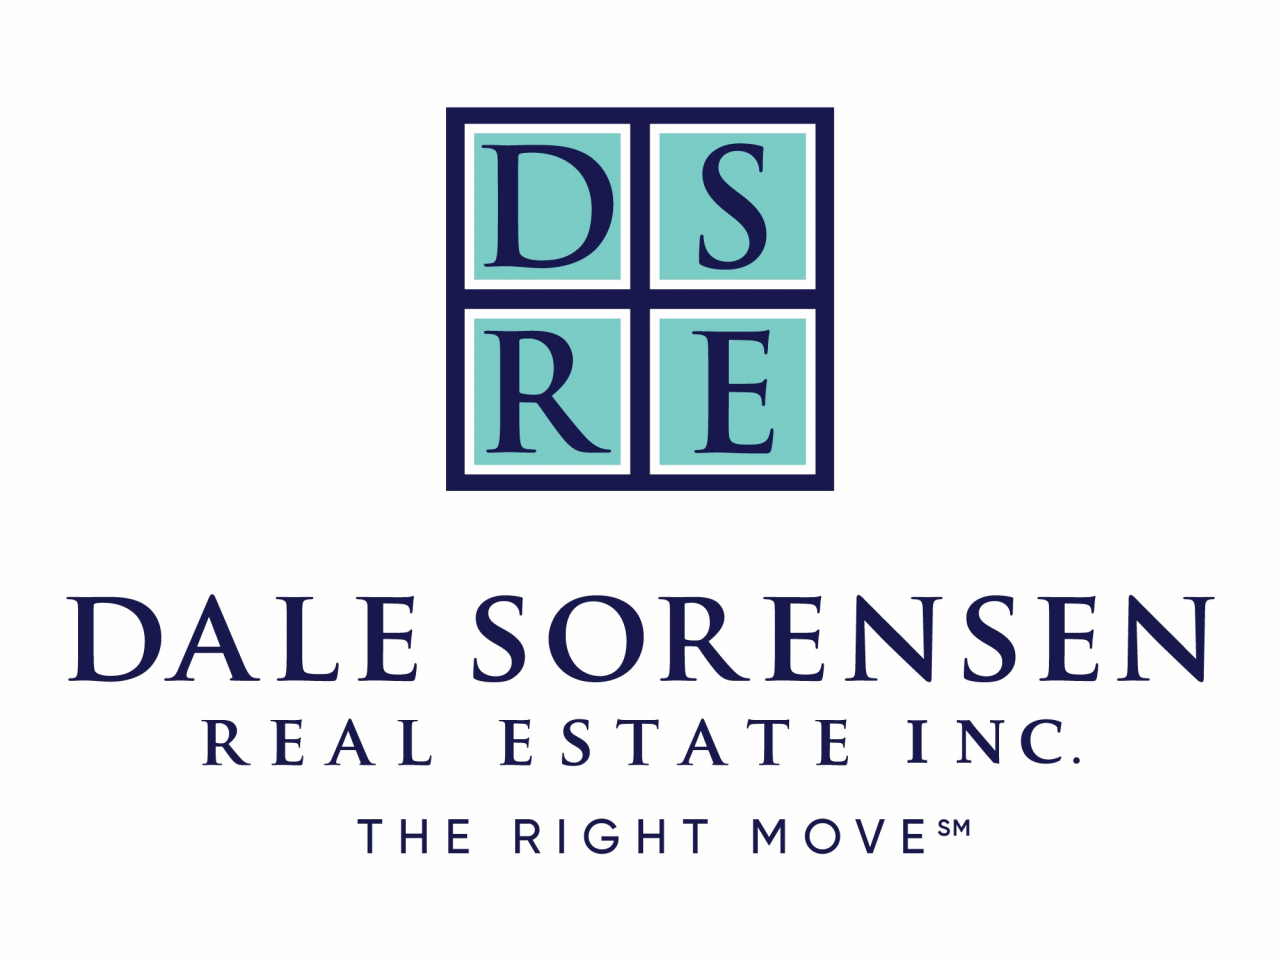 Dale Sorensen Real Estate Inc.